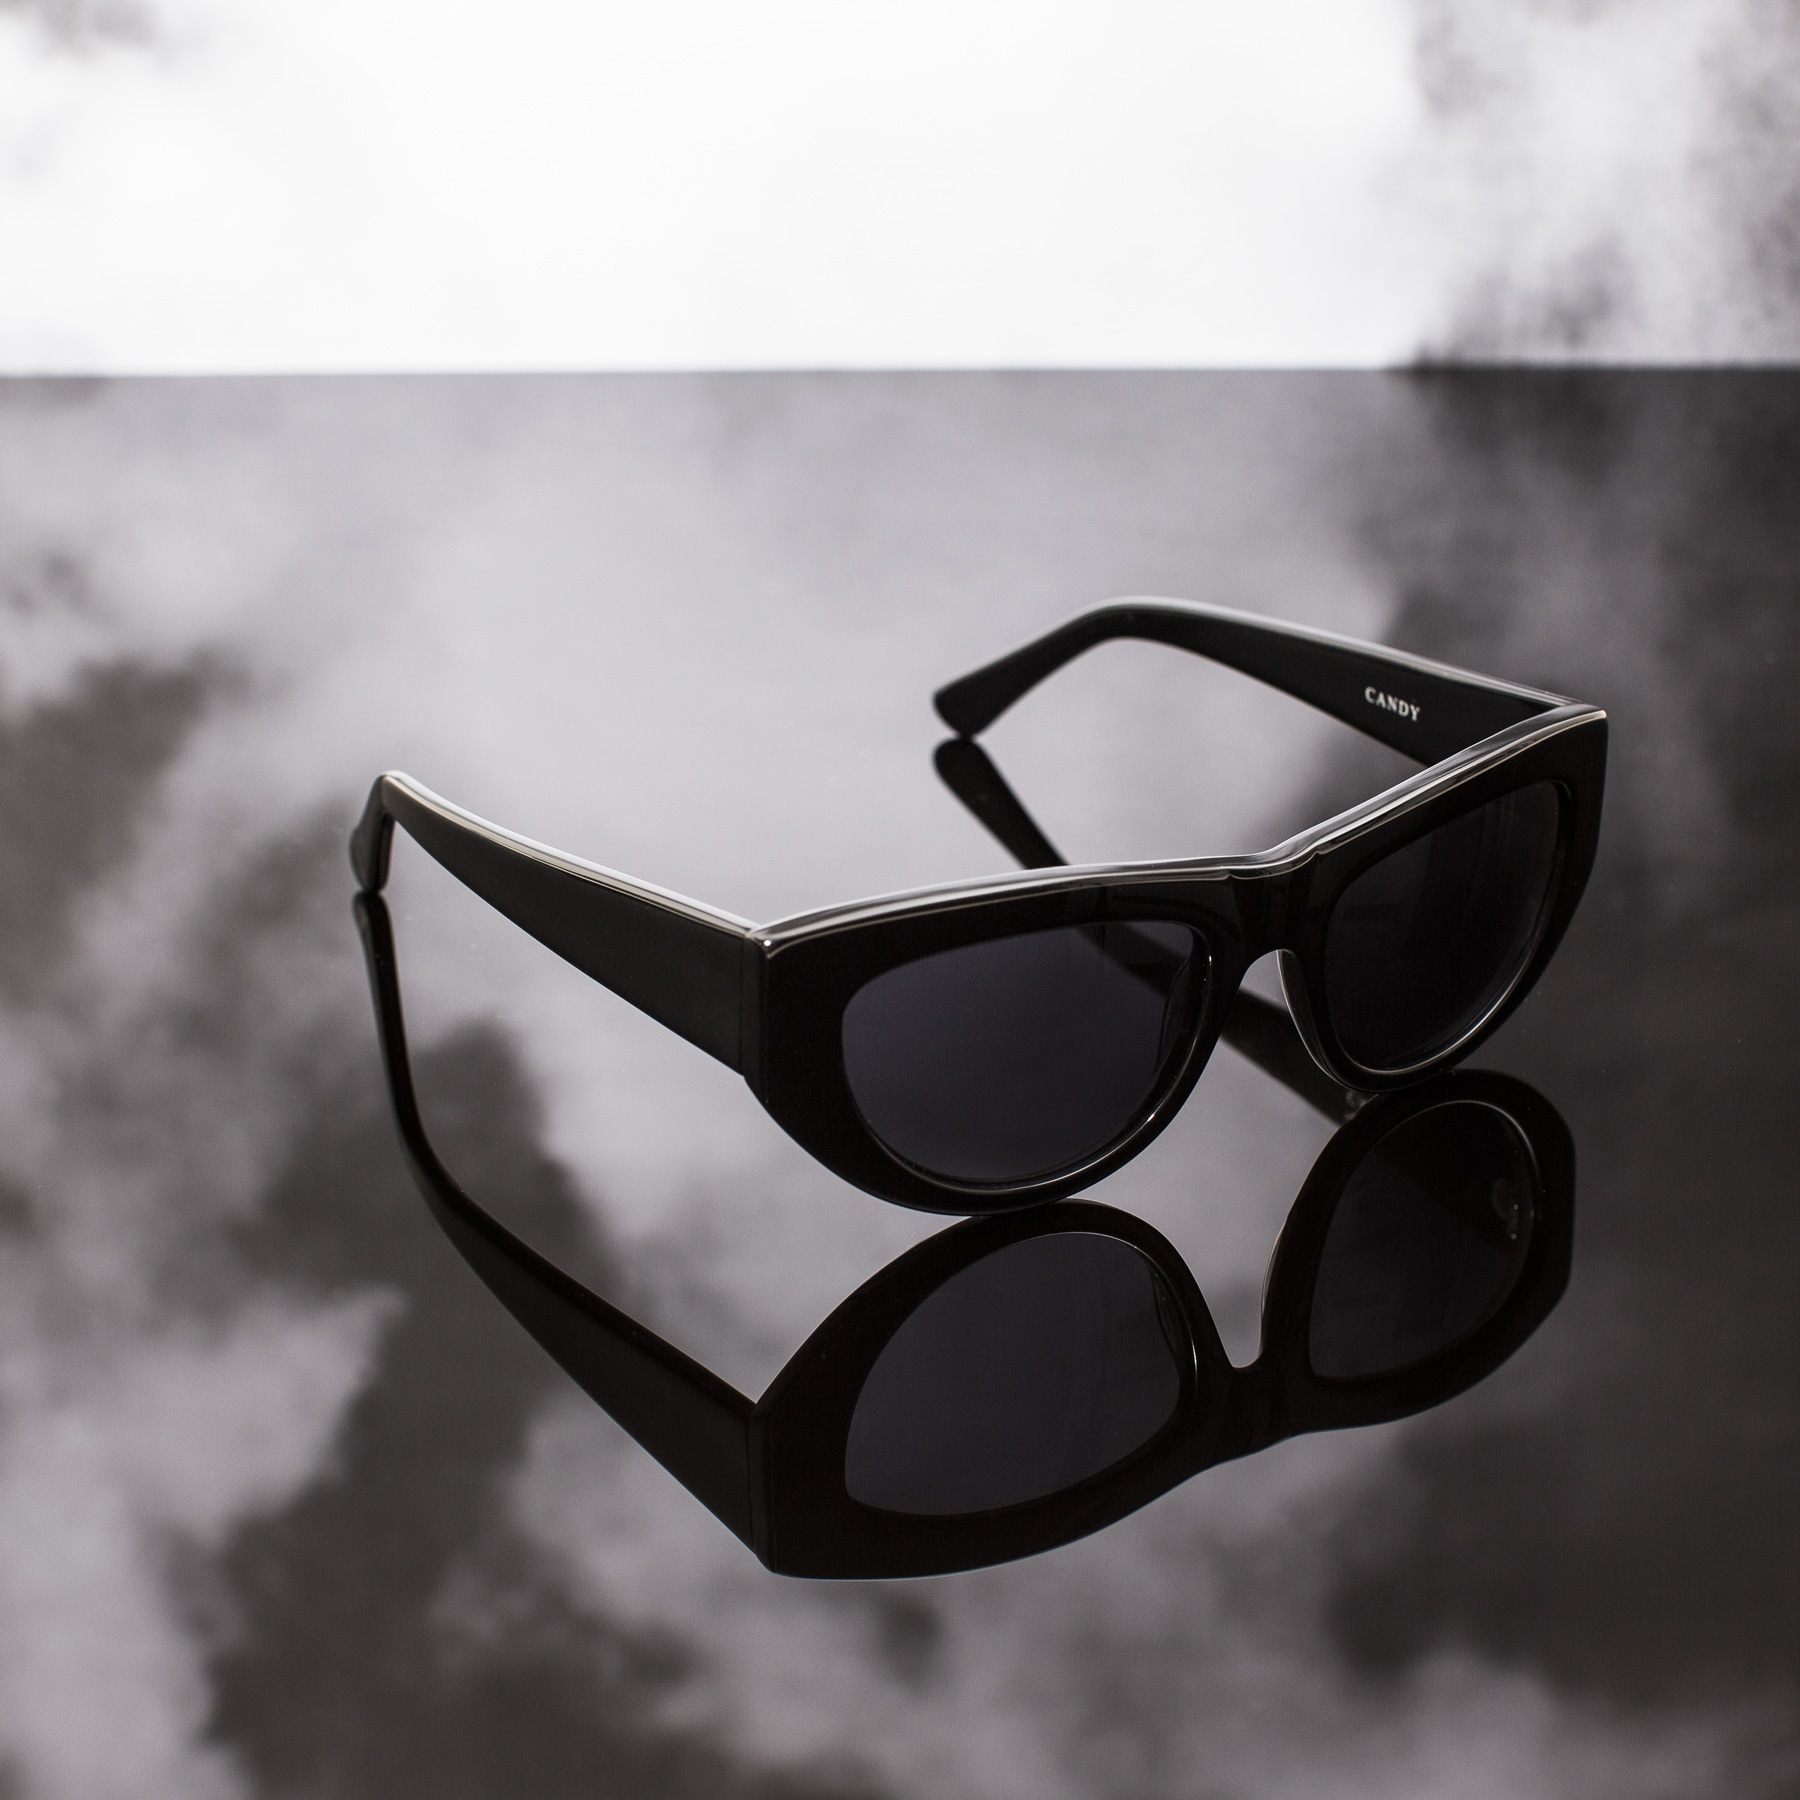 EPOKHE-photography-styling-artwork-agency-claudio-kirac-09.jpg